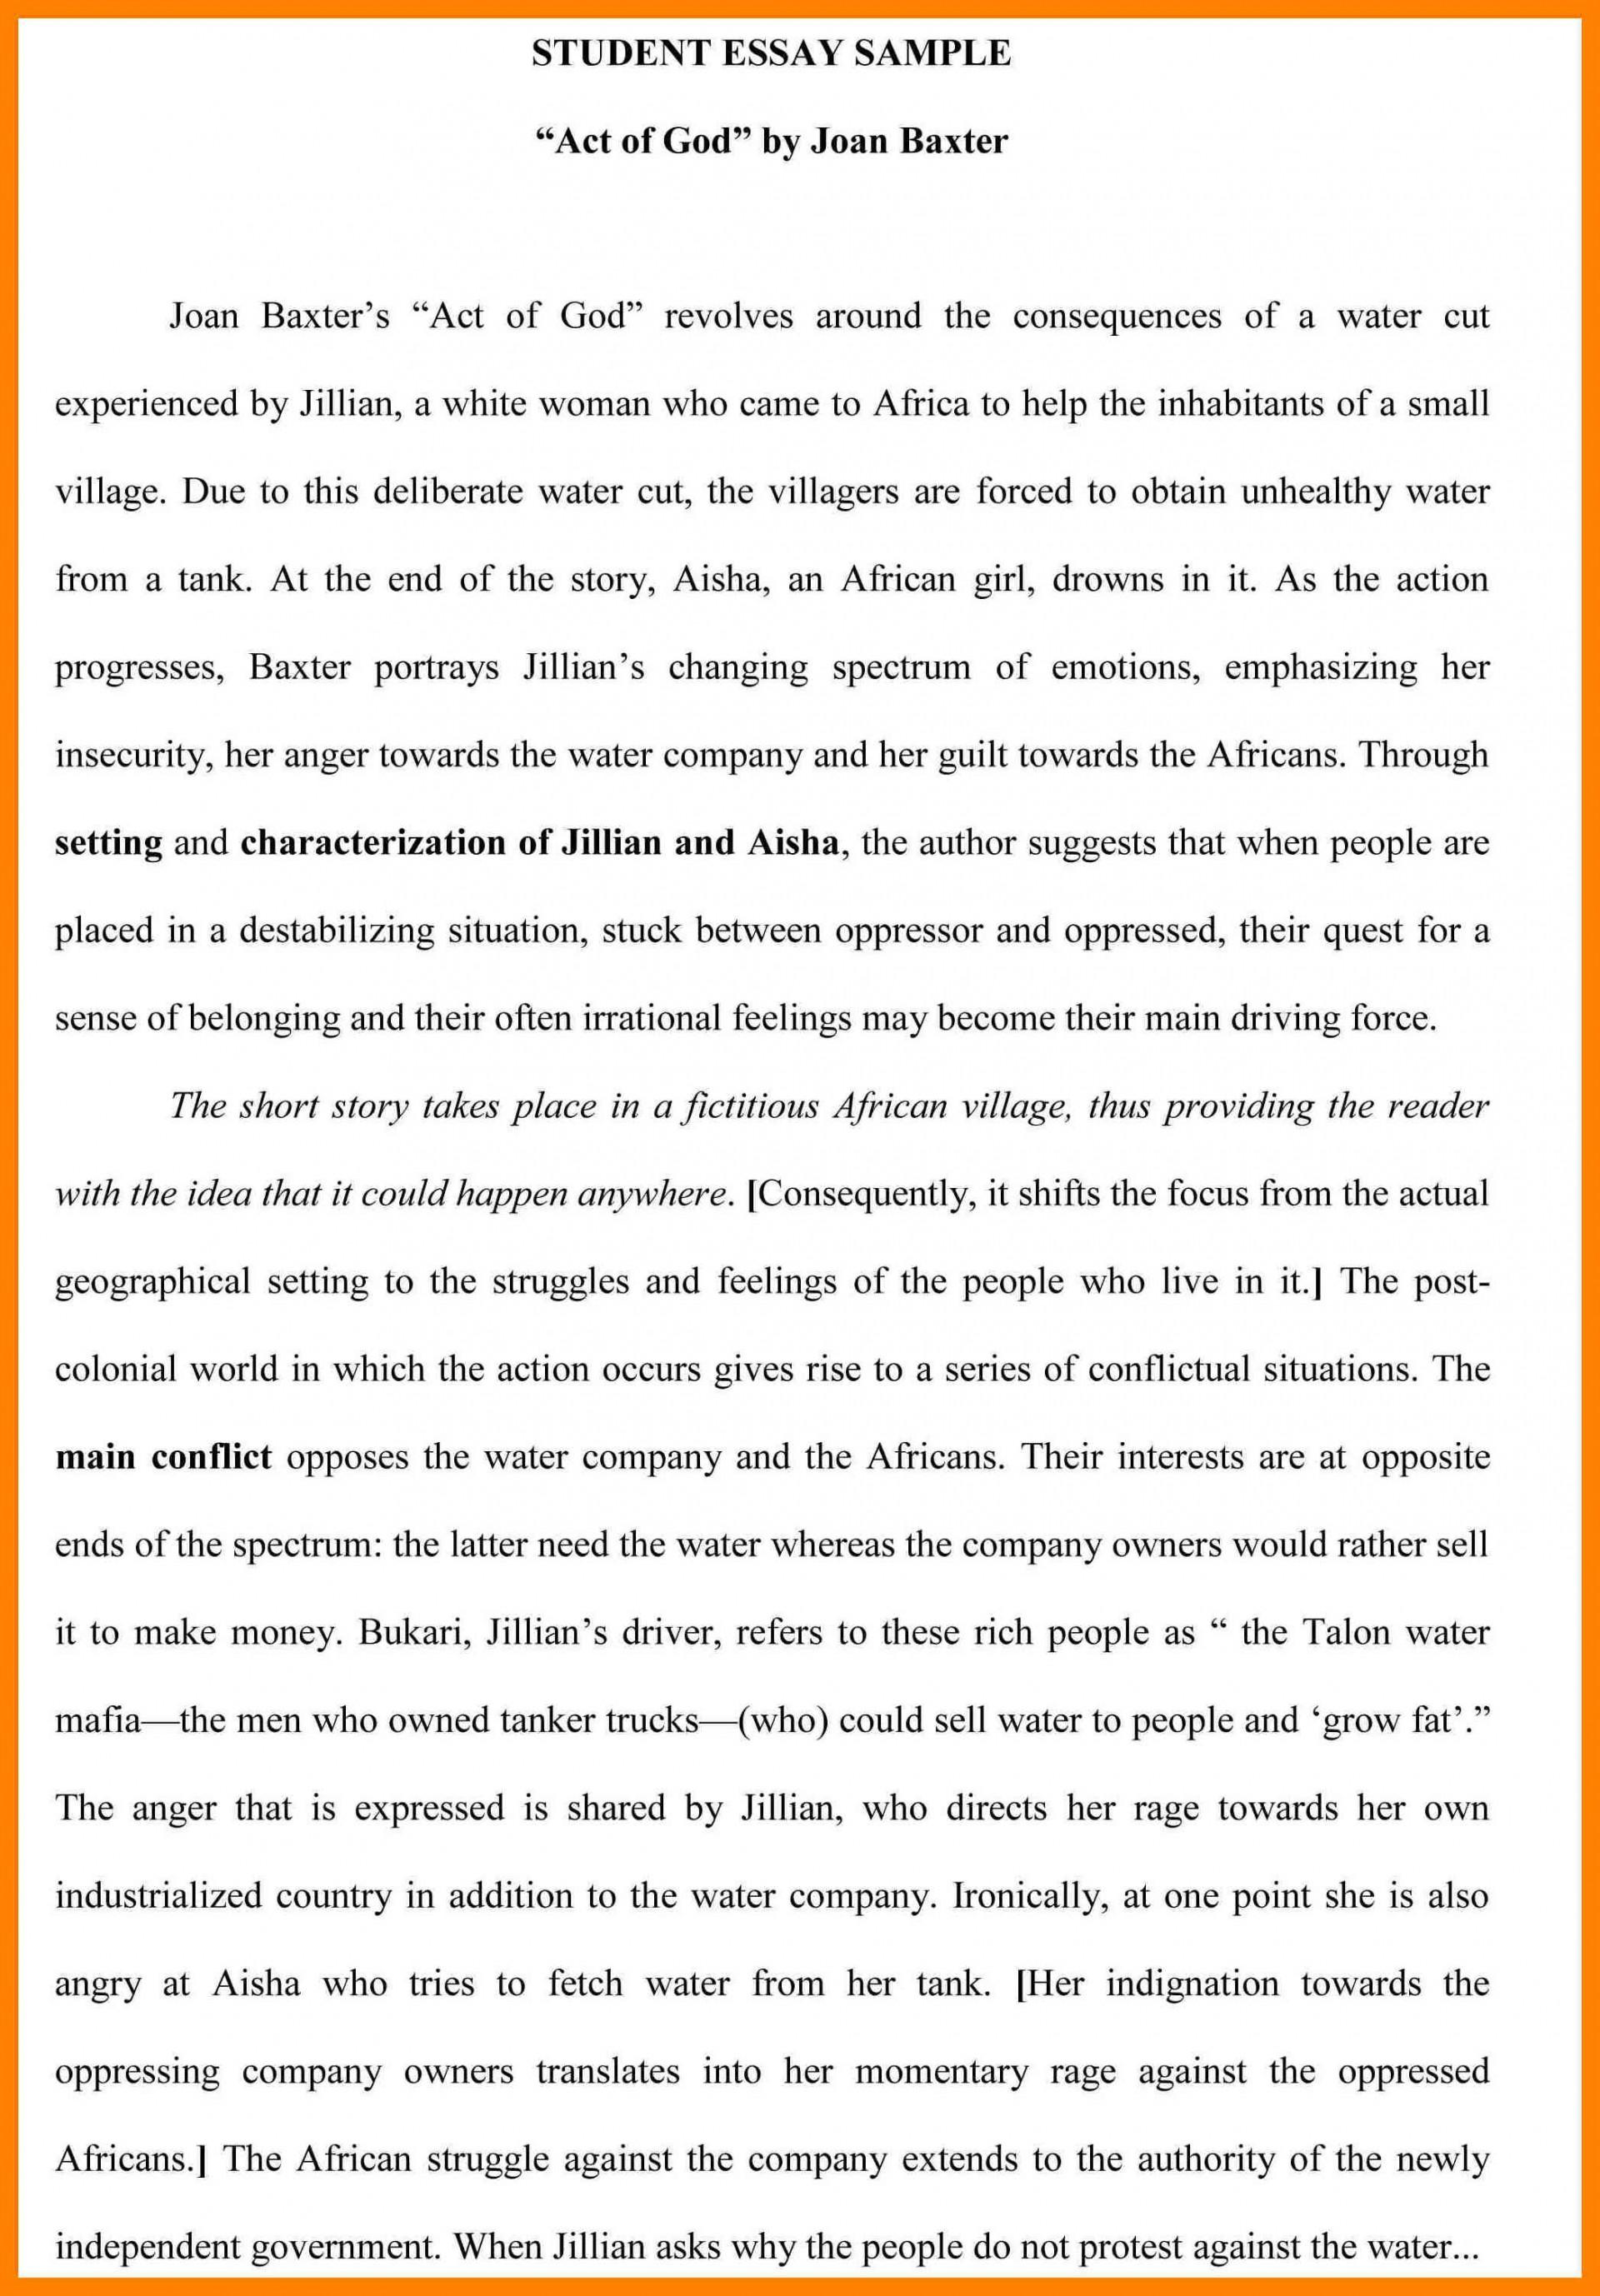 001 Sample Math Test Act Elmifermetures Com Ideas Collection Essay Awesome Of Livesto Essays Pdf New Topics Wonderful 1920